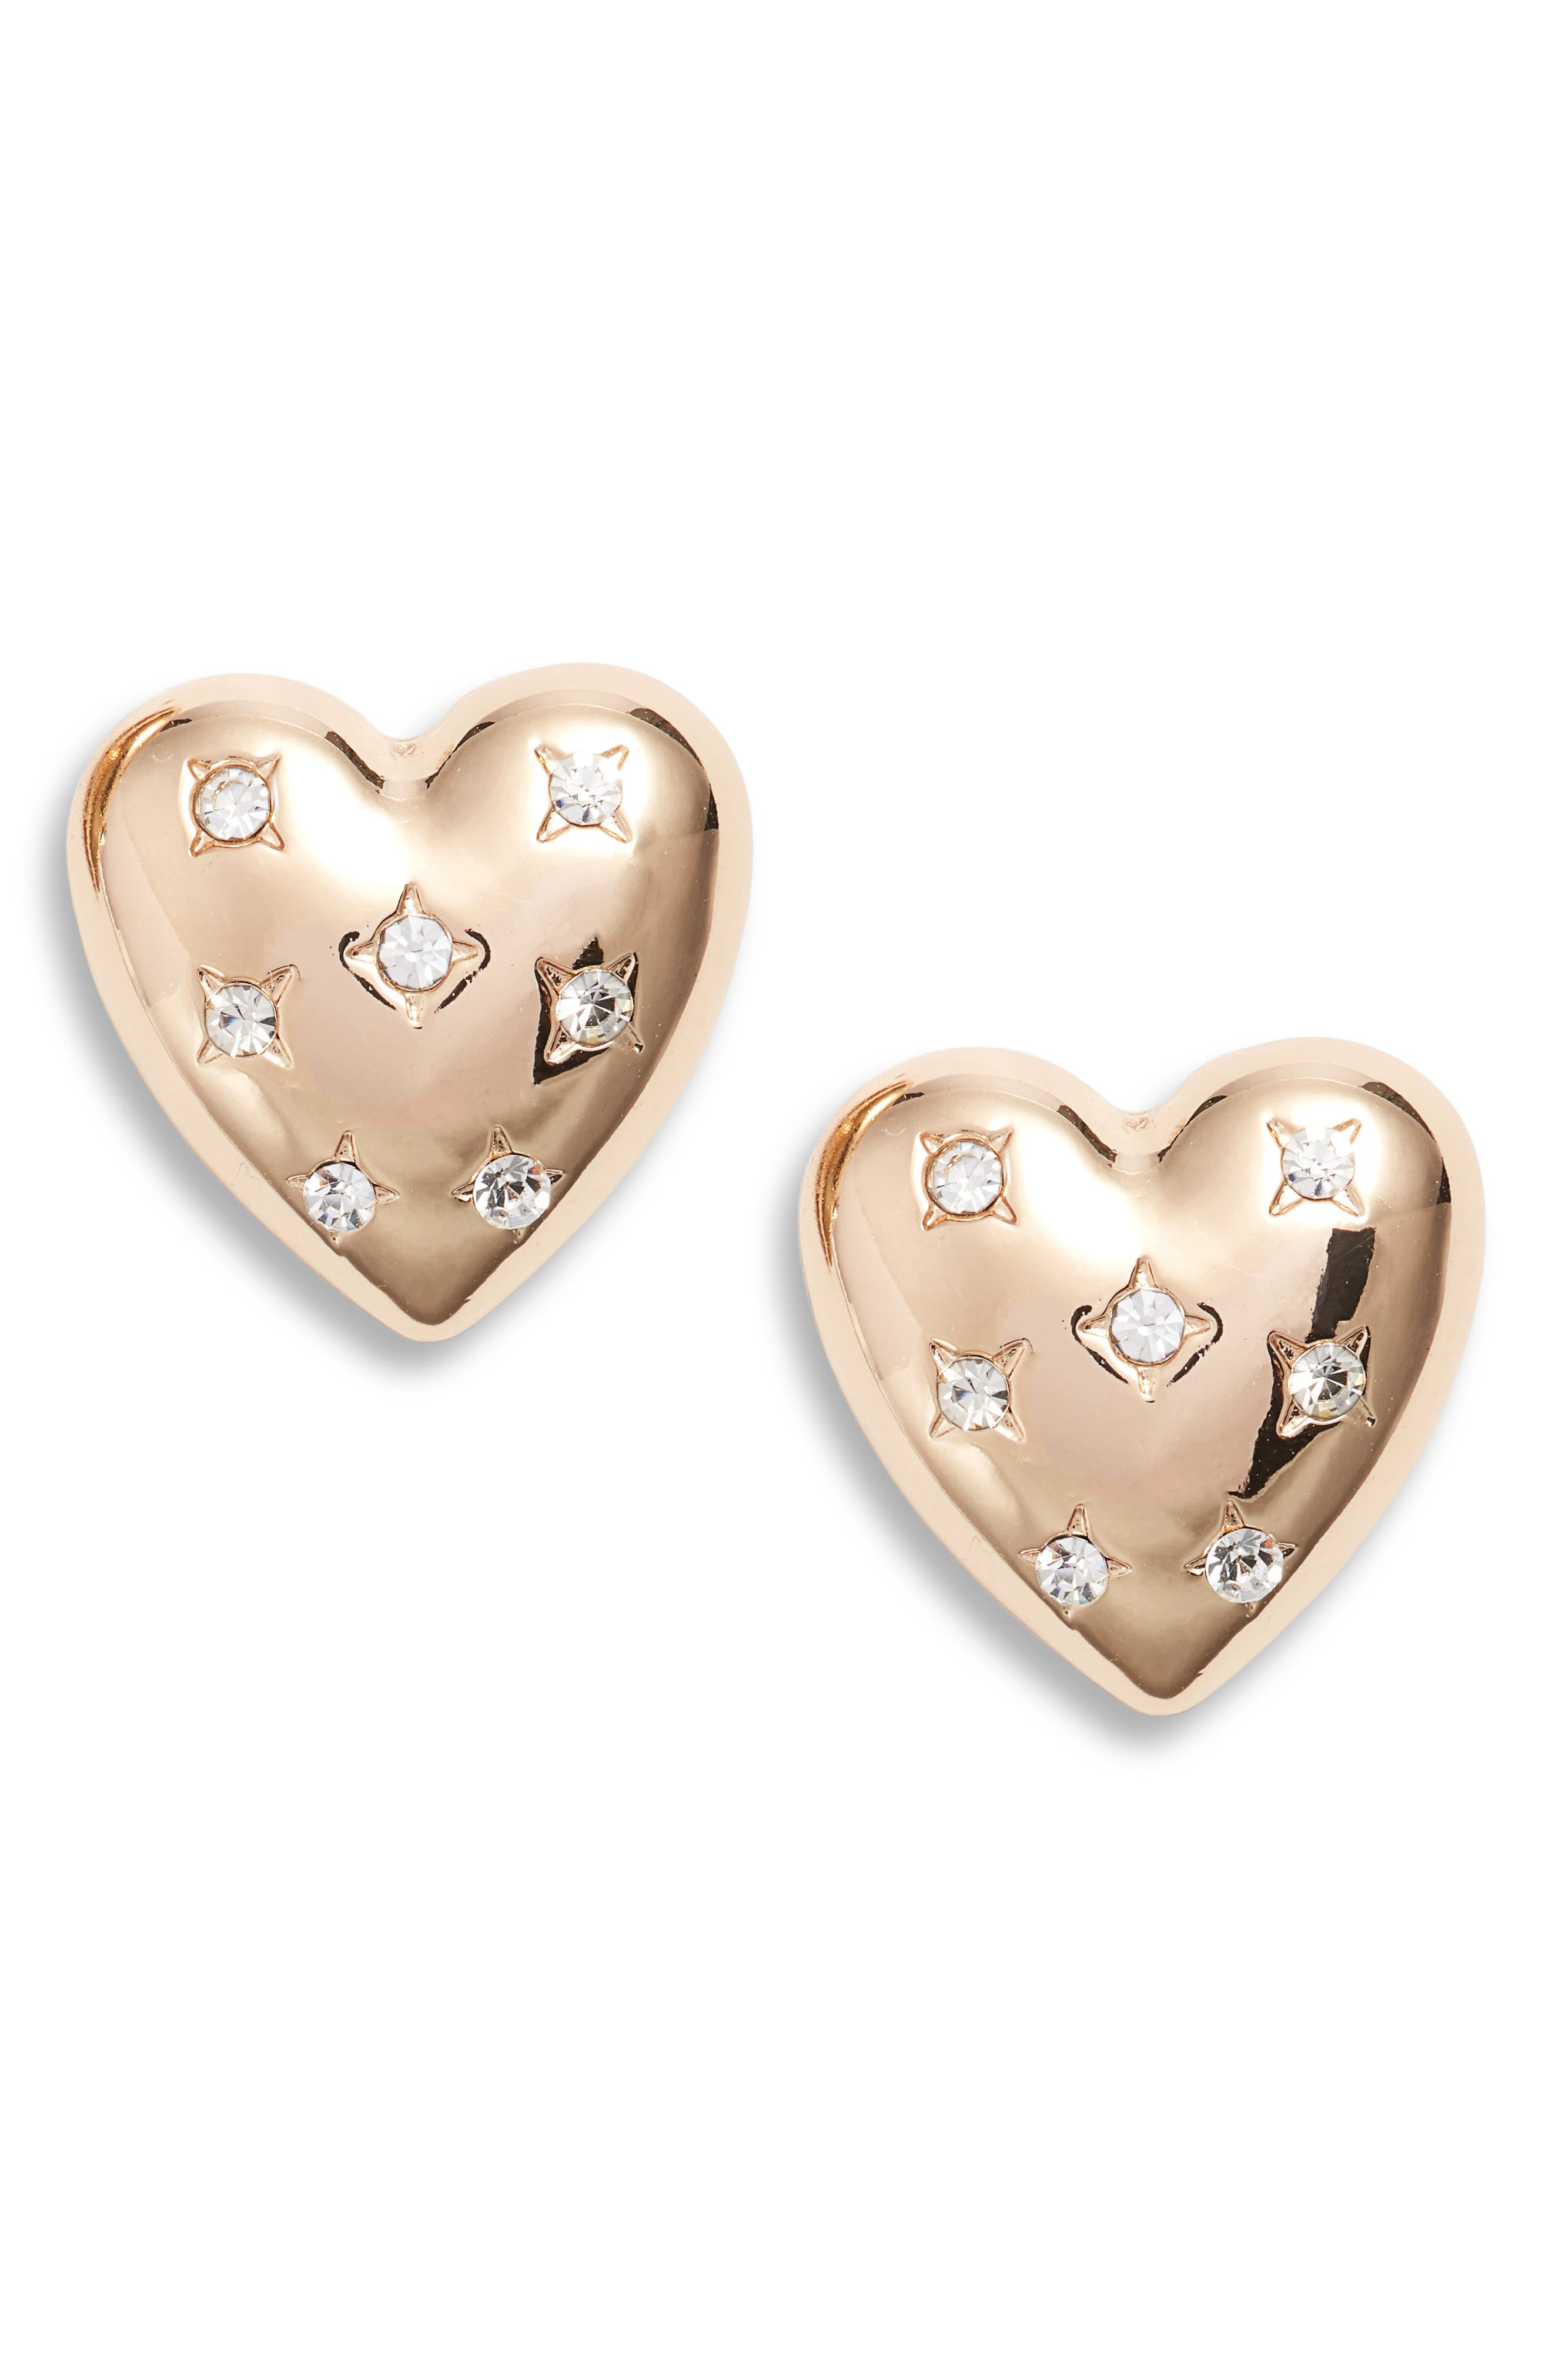 Crystal Heart Stud Earrings,                         Main,                         color, GOLD/ CRYSTAL